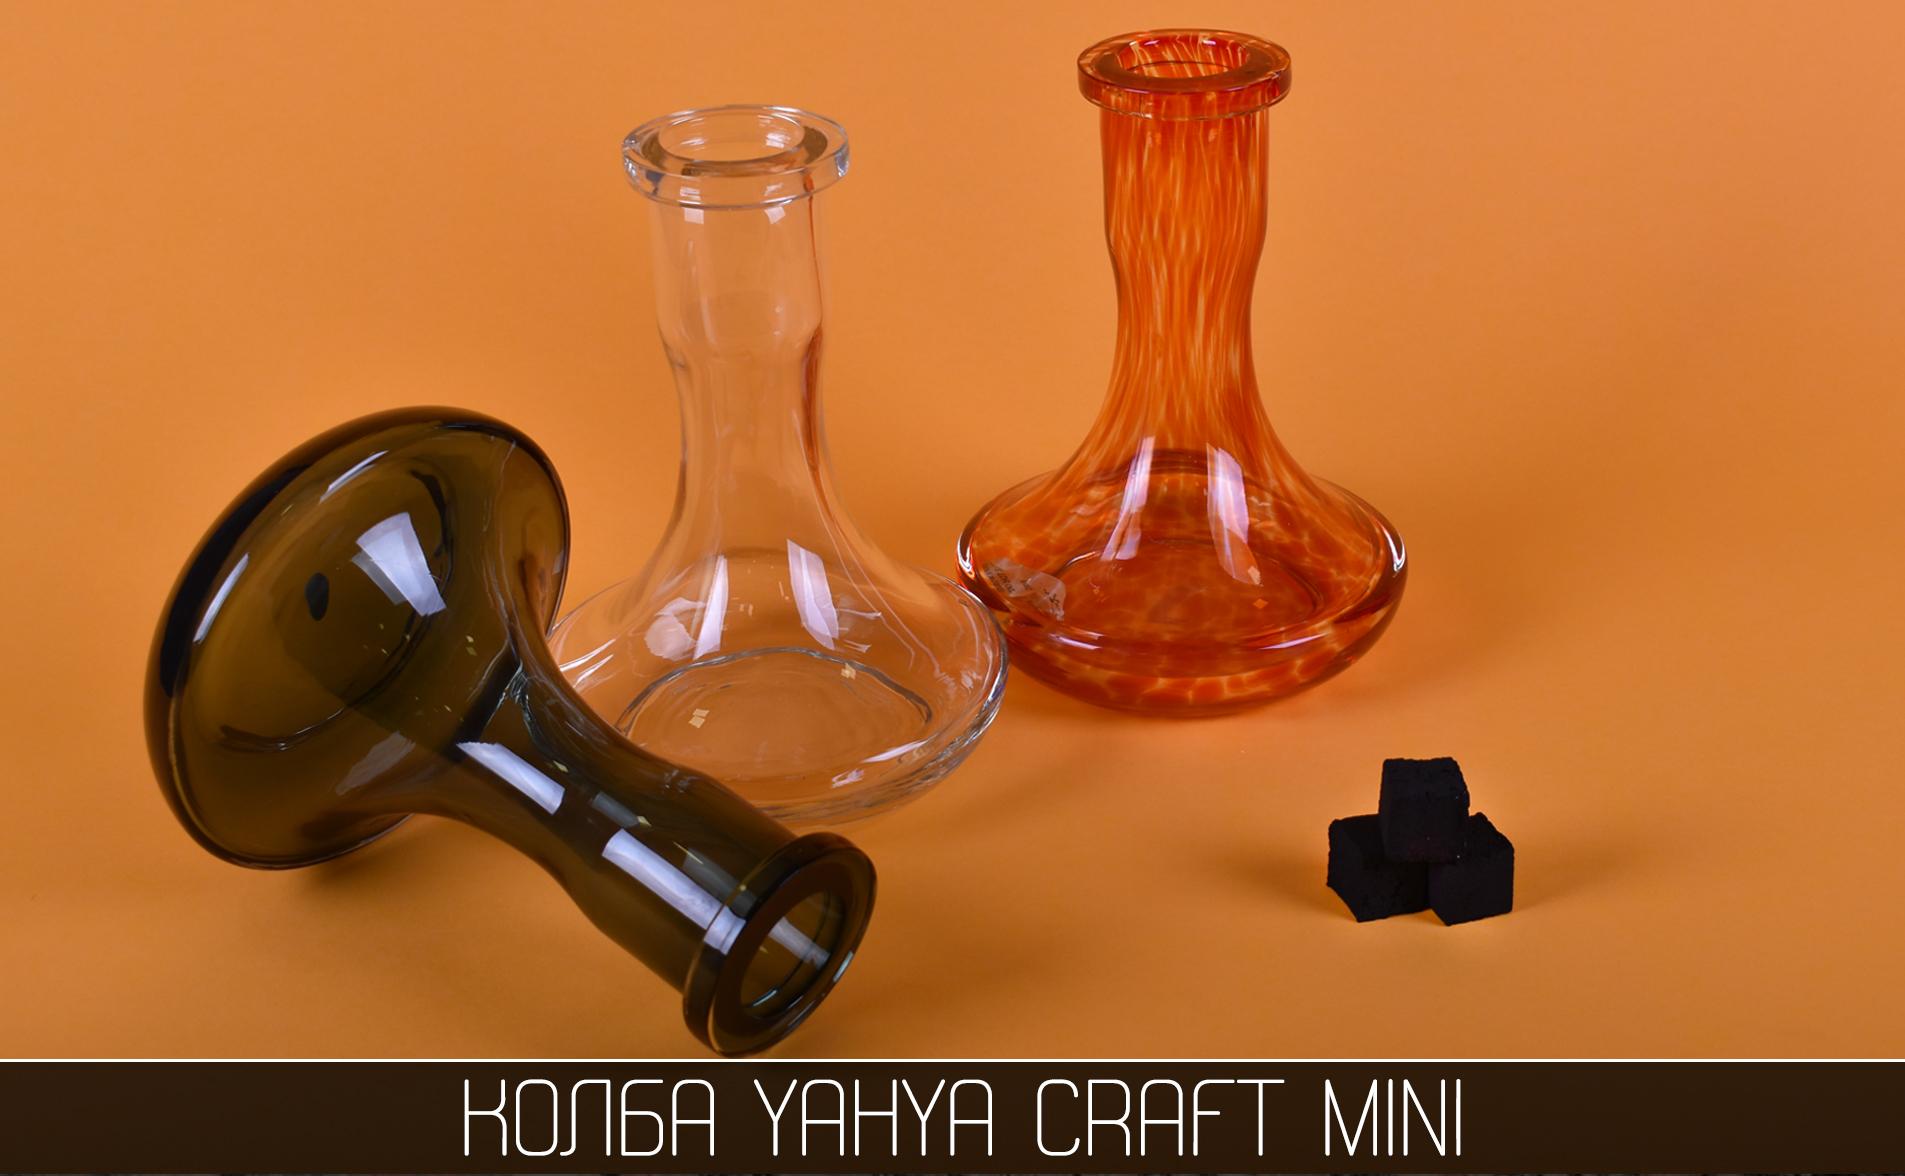 Колба для кальяна Yahya Craft Mini - фото 4 - Kalyanchik.ua